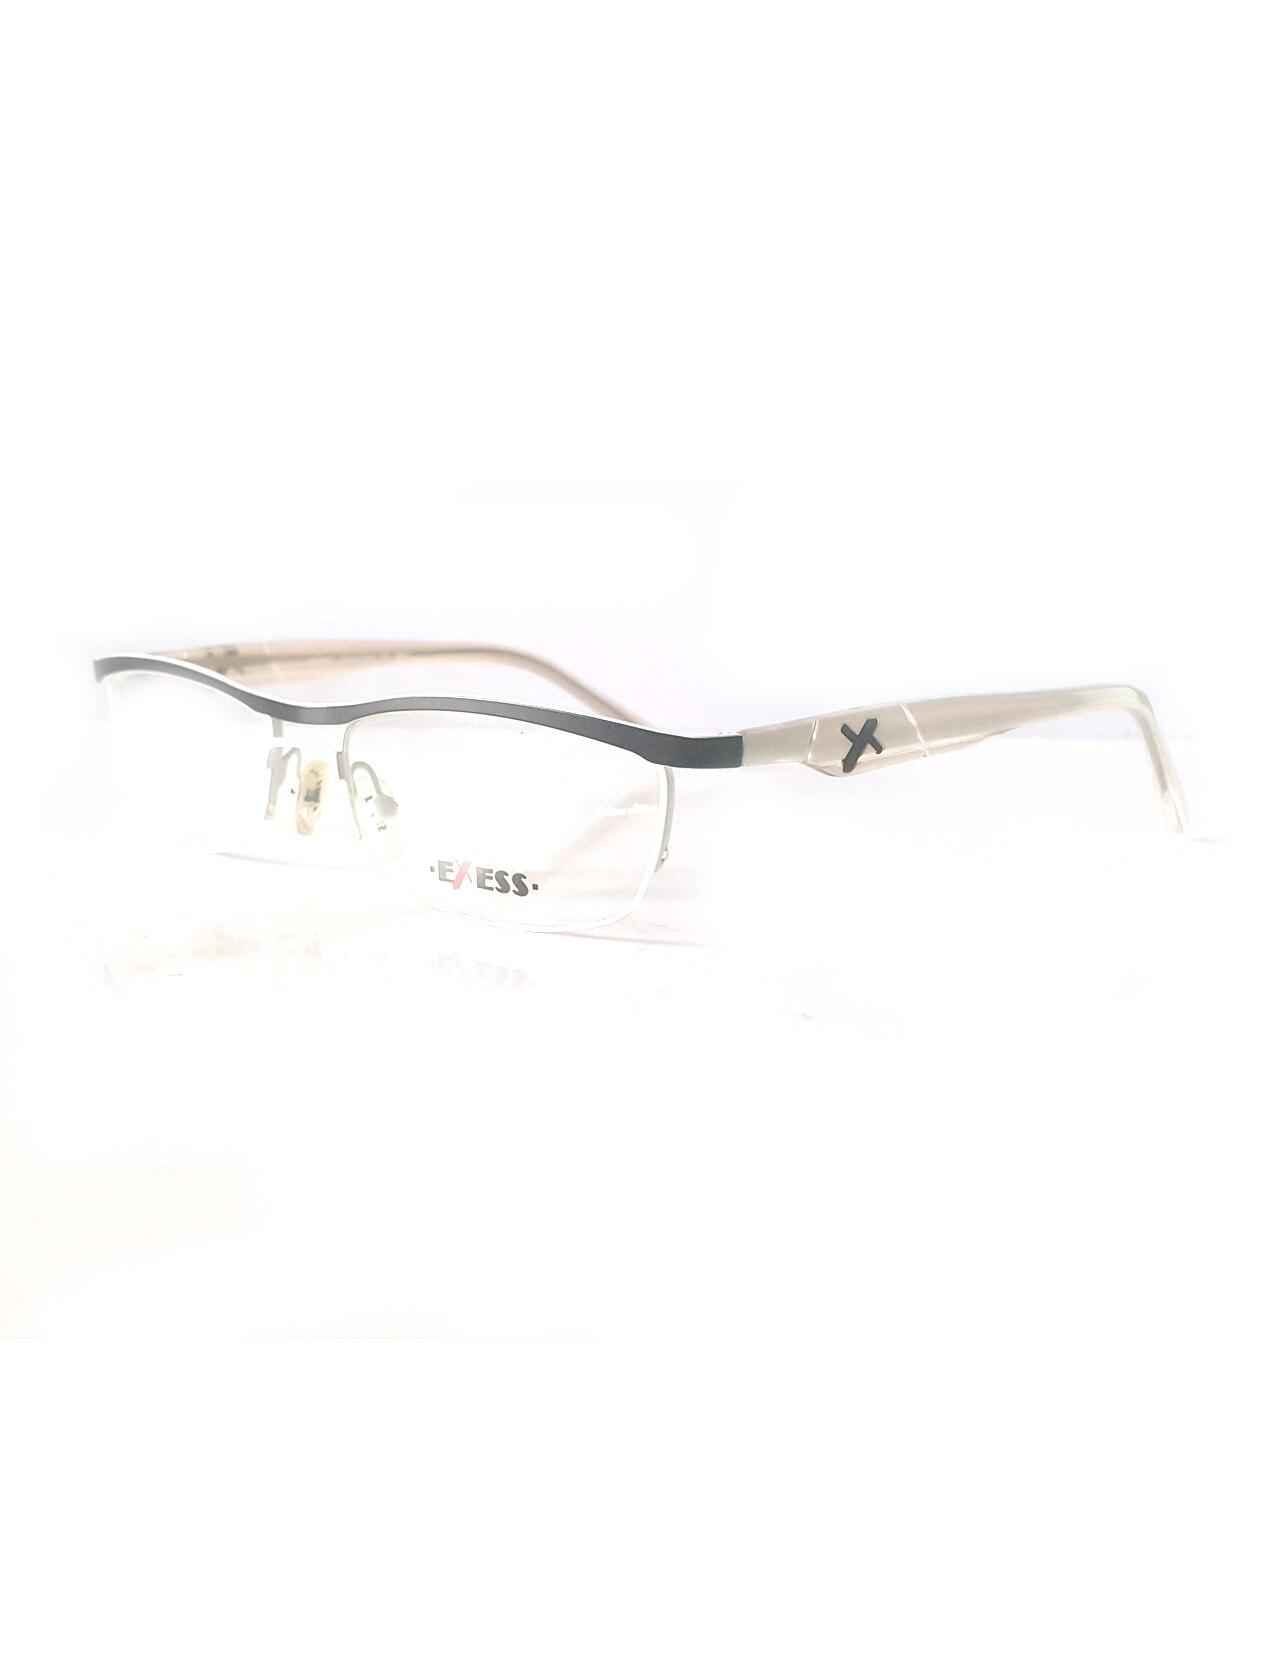 Markamilla Women Reading Glasses Frame Demo Glasses Eyewear Transparent High Quality WomenExess E 3295 5243 53